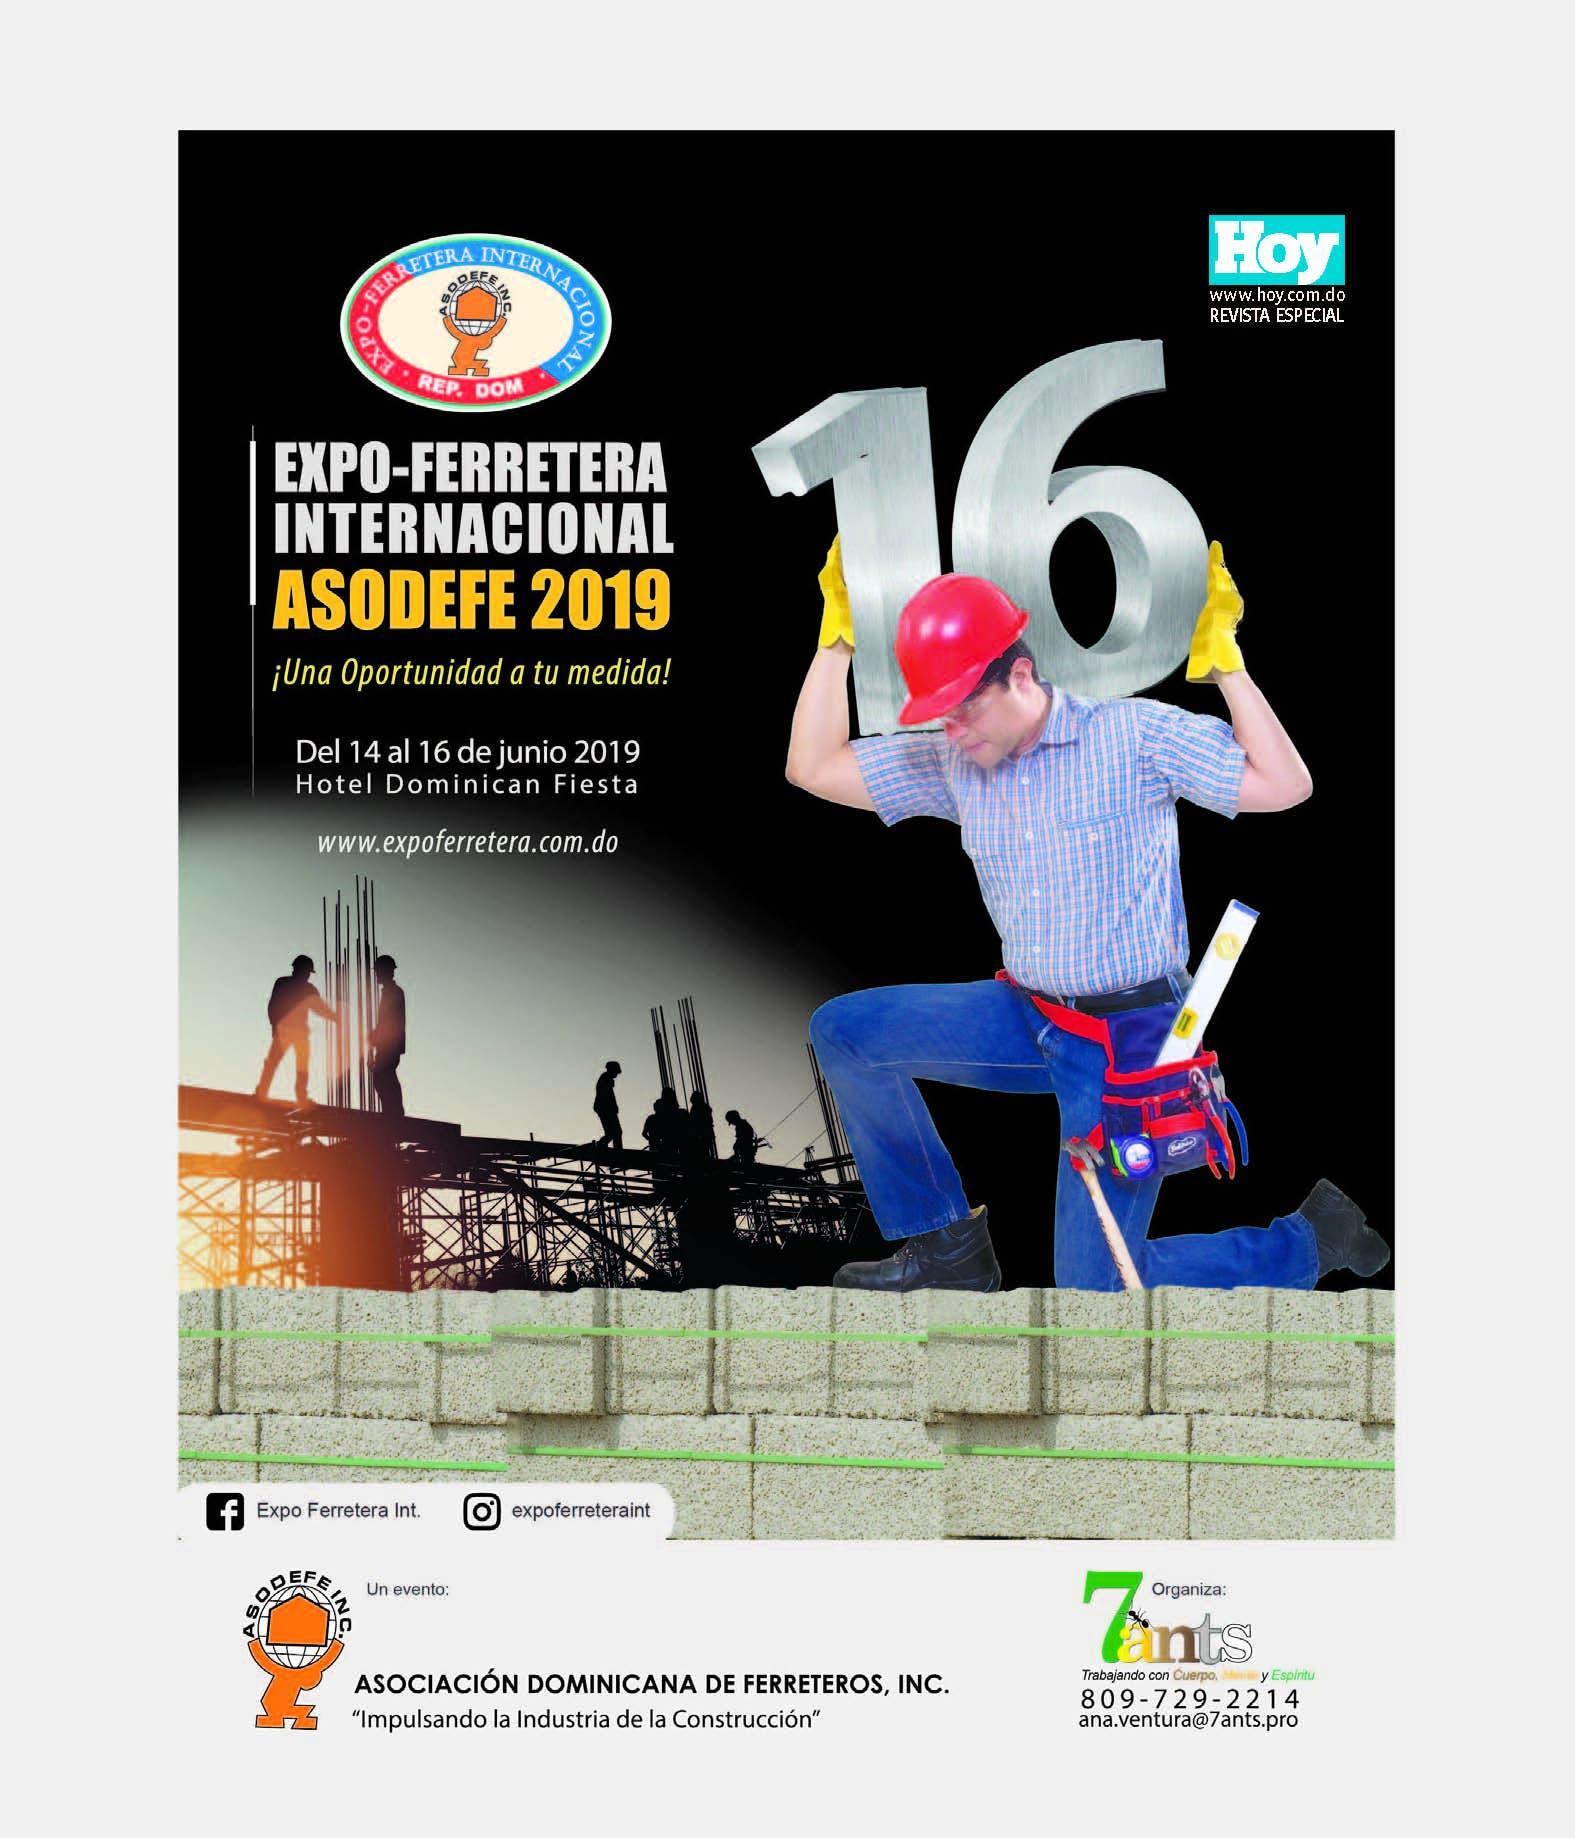 Expo Ferretera 2019